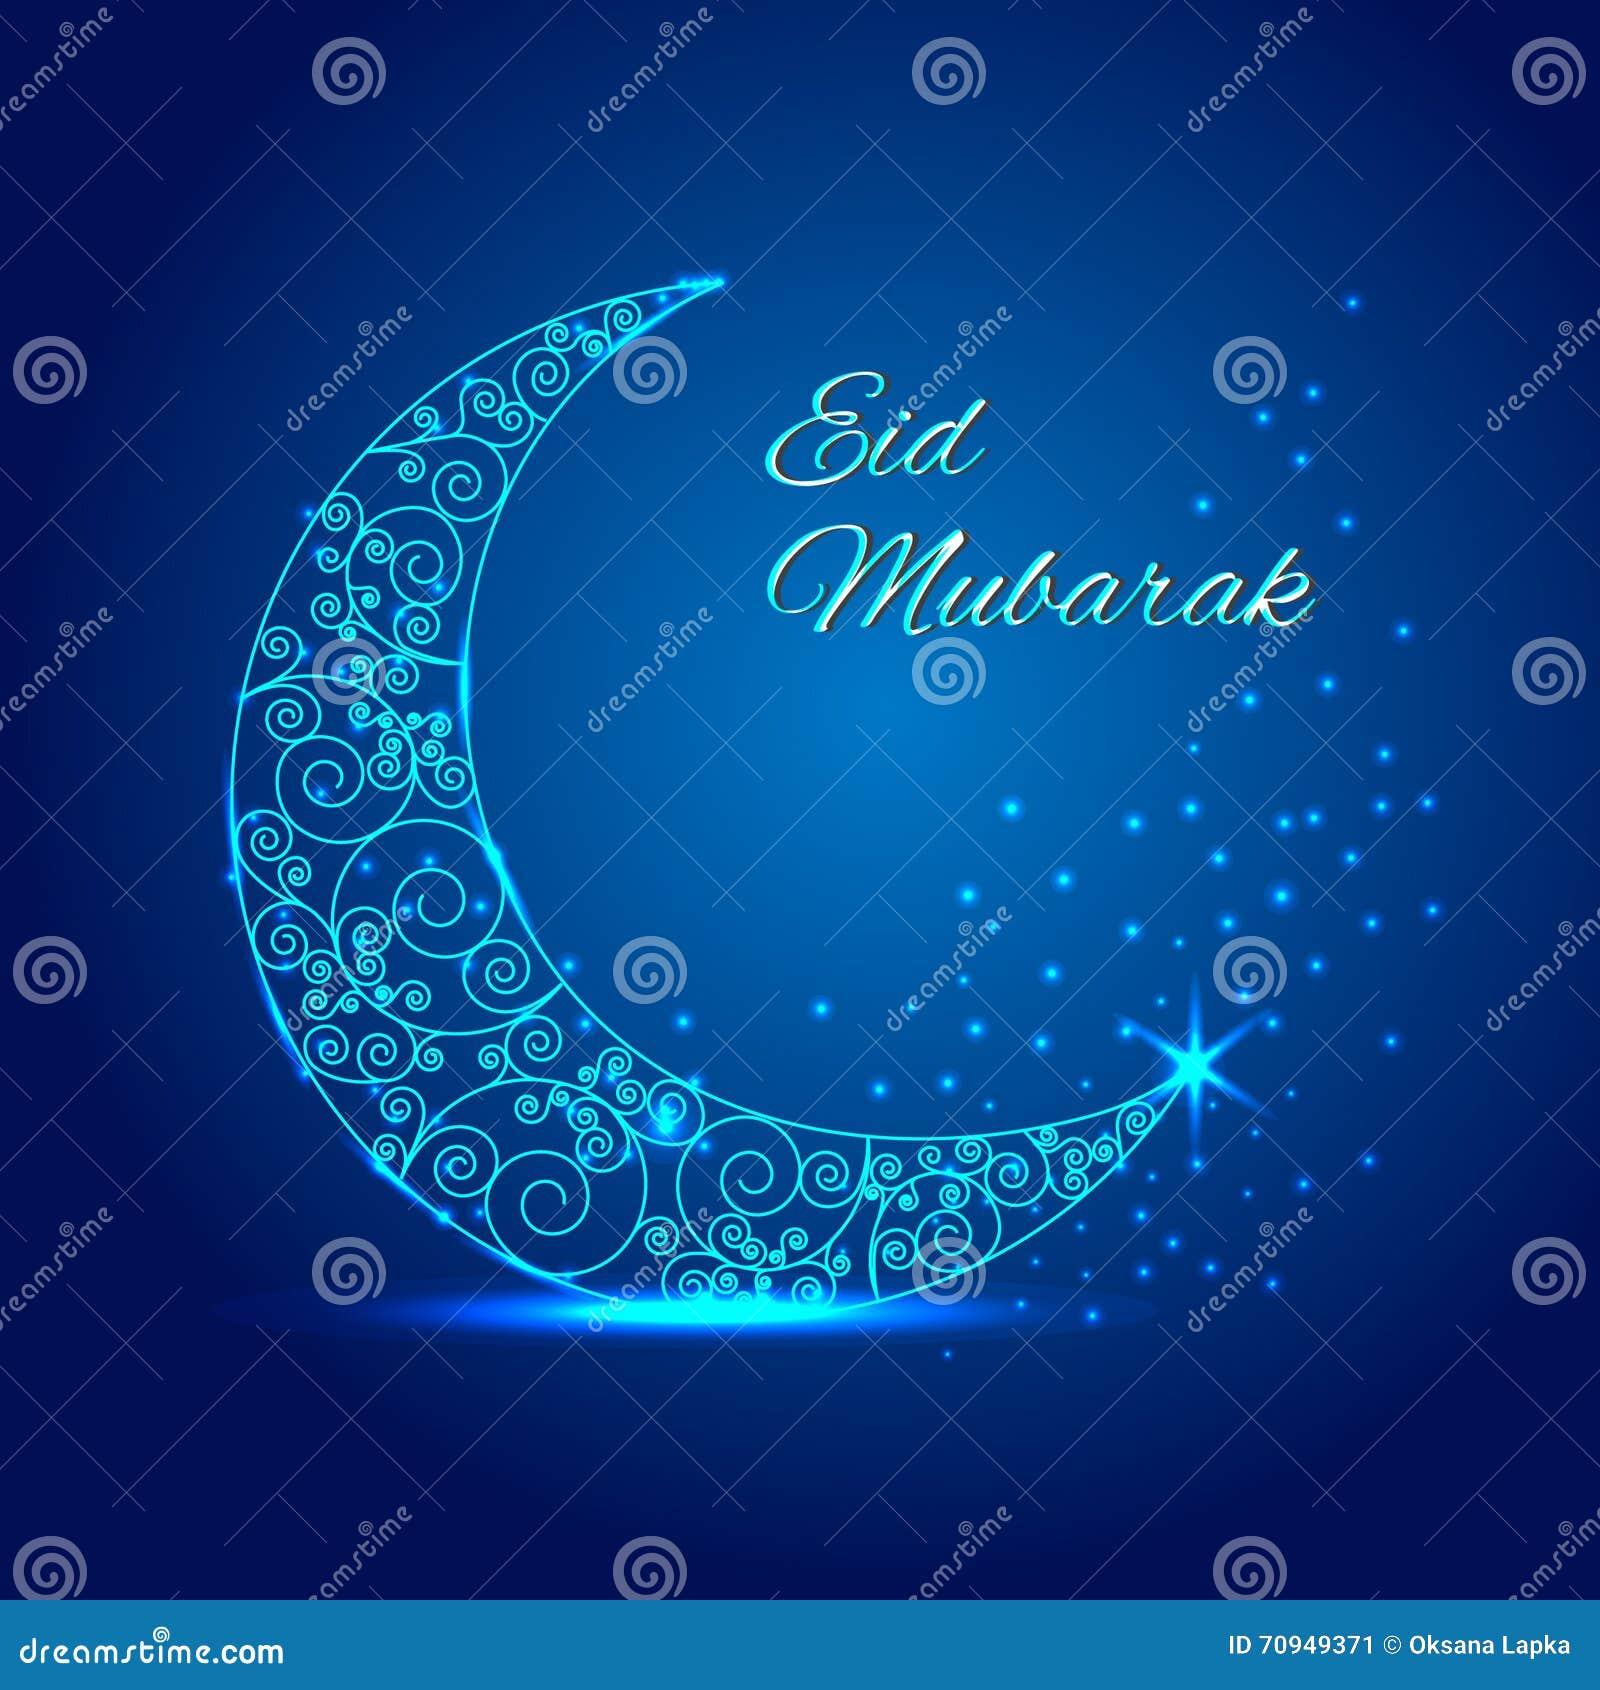 Ramadan mubarak greeting cardiny decorated crescent moon with ramadan mubarak greeting cardiny decorated crescent moon with stylish text eid mubarak on blue background kristyandbryce Choice Image